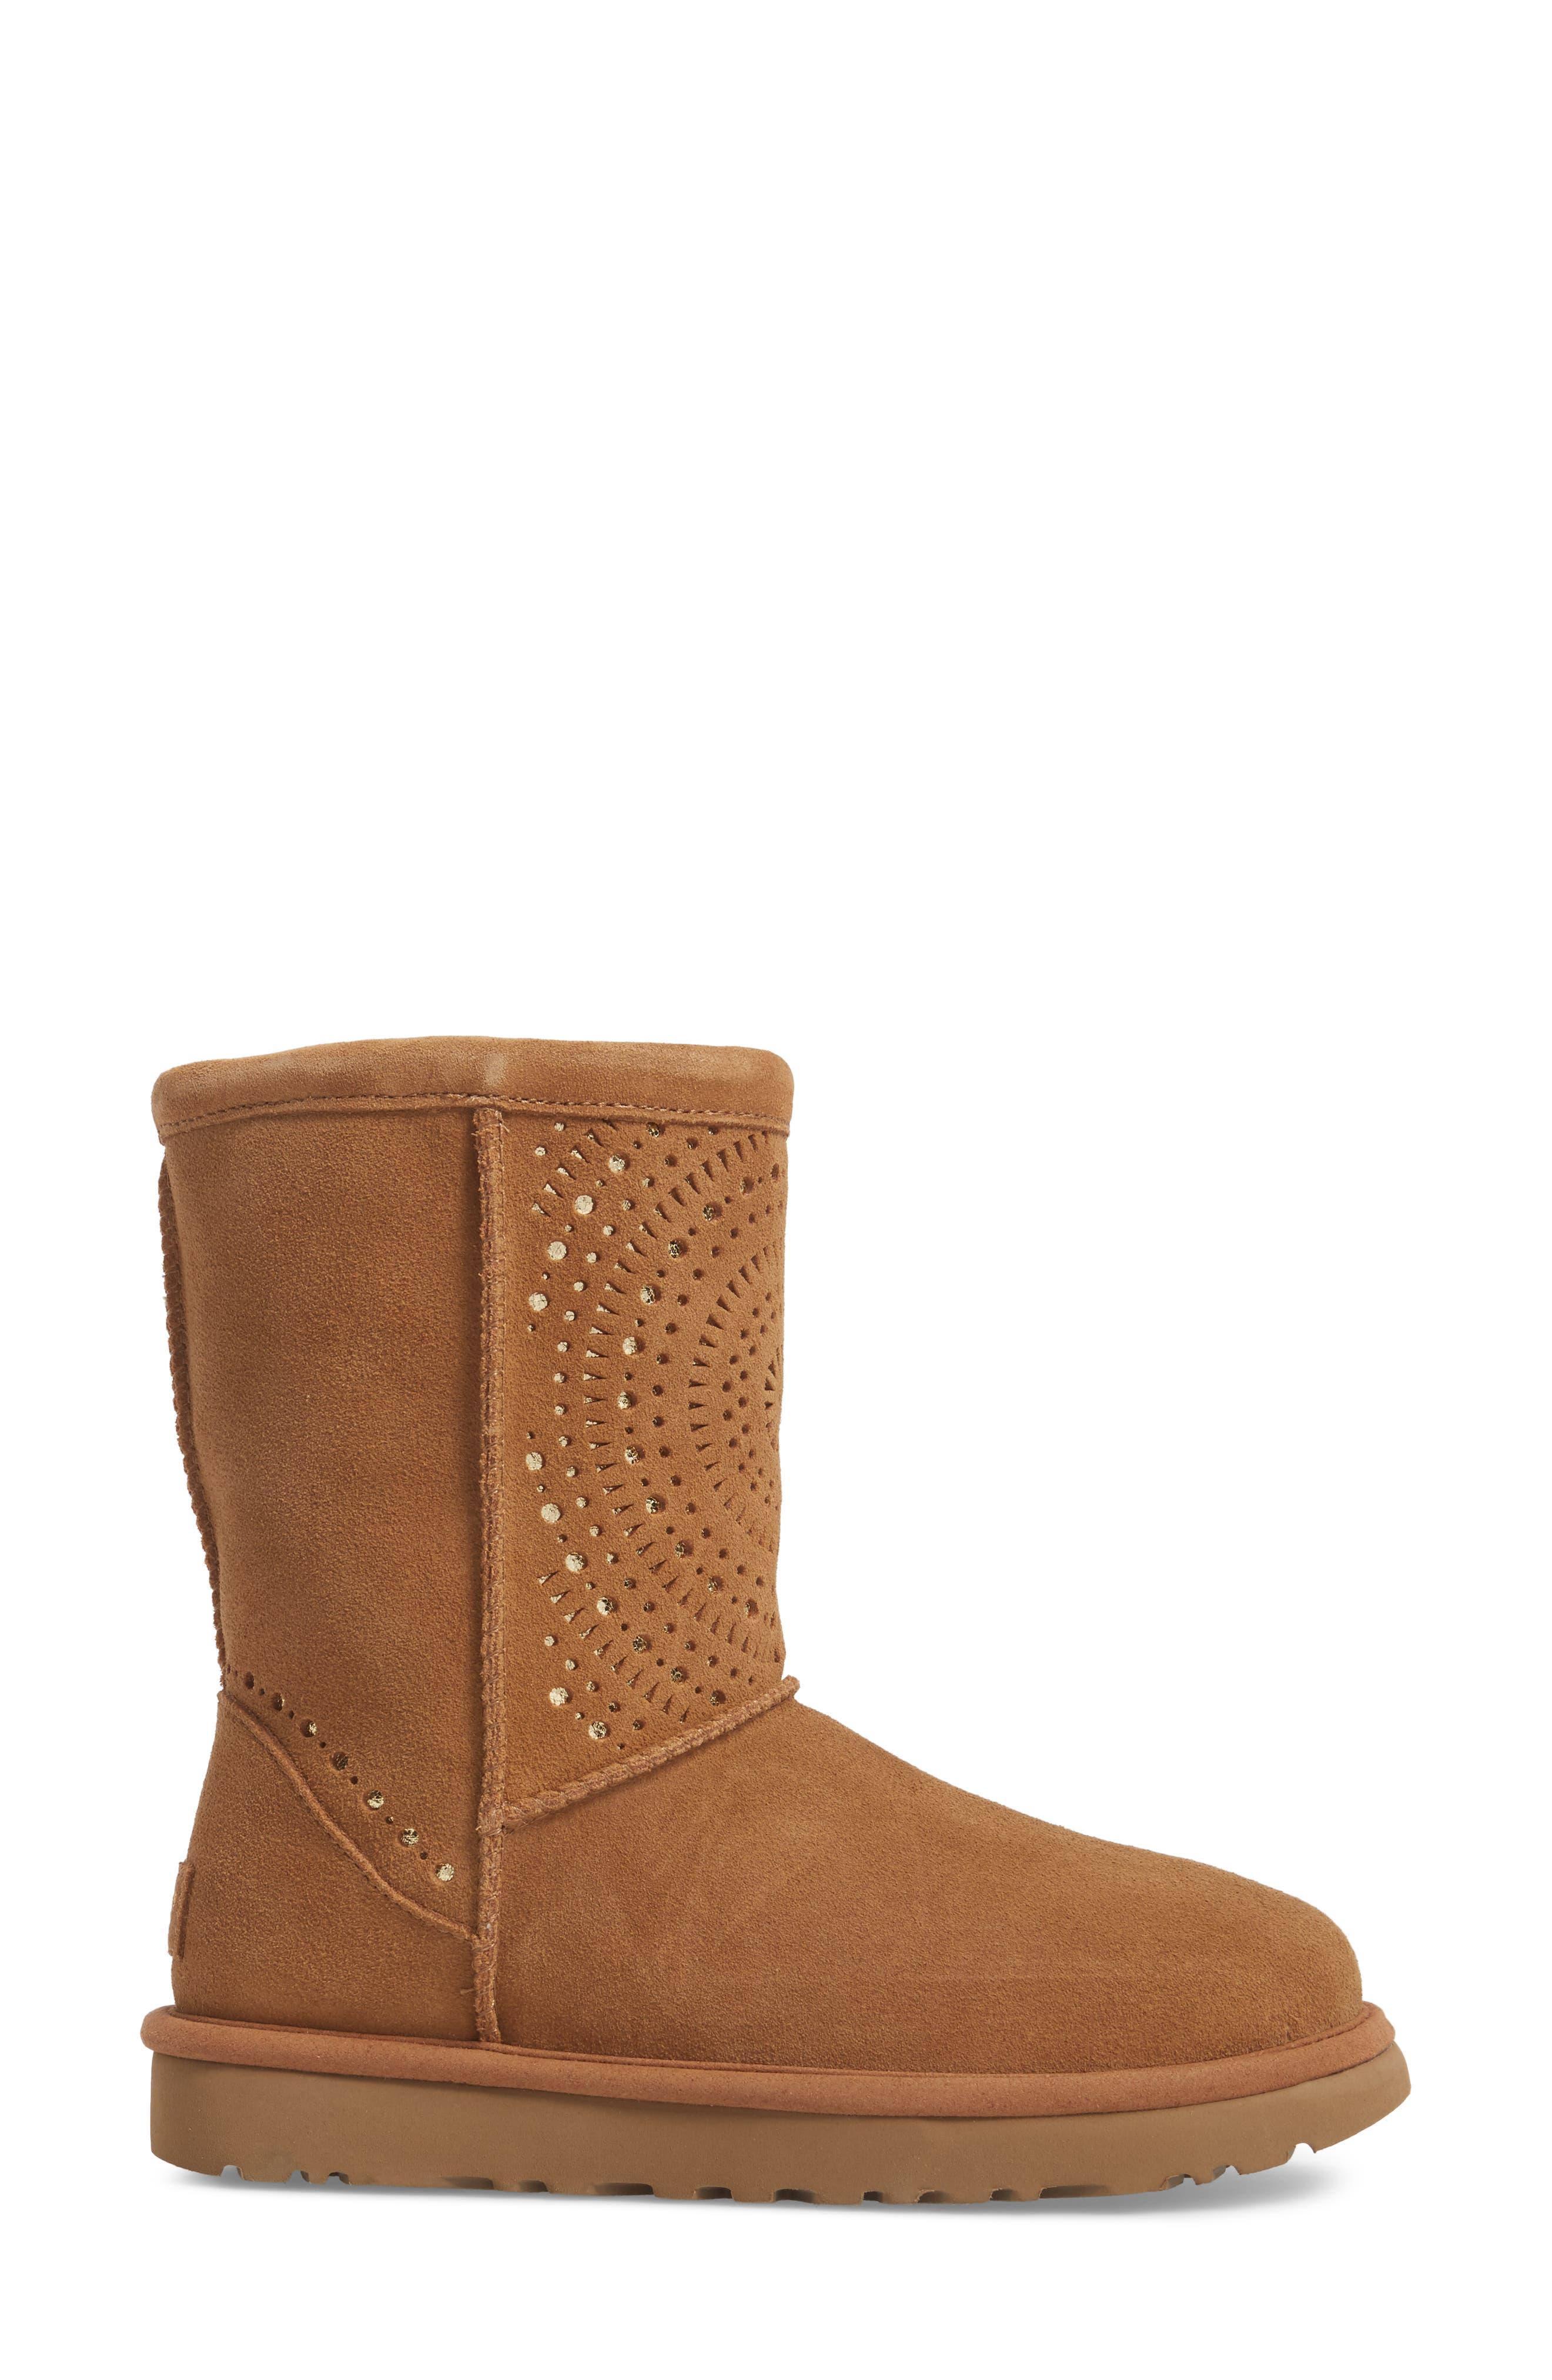 Alternate Image 3  - UGG® Classic Short Sunshine Perforated Boot (Women)